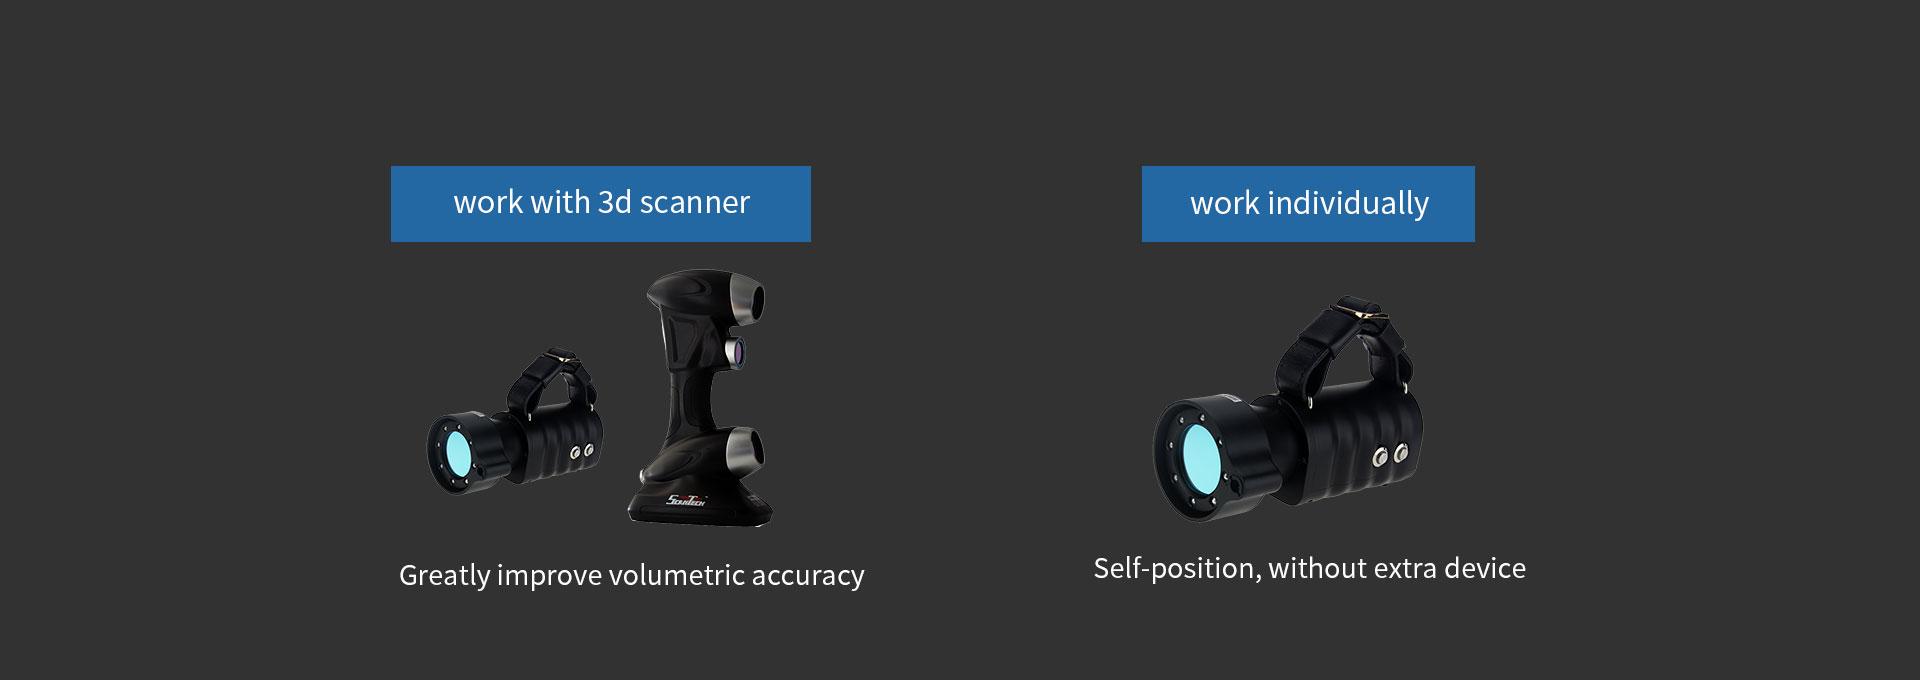 MSCAN Photogrammetry System 3